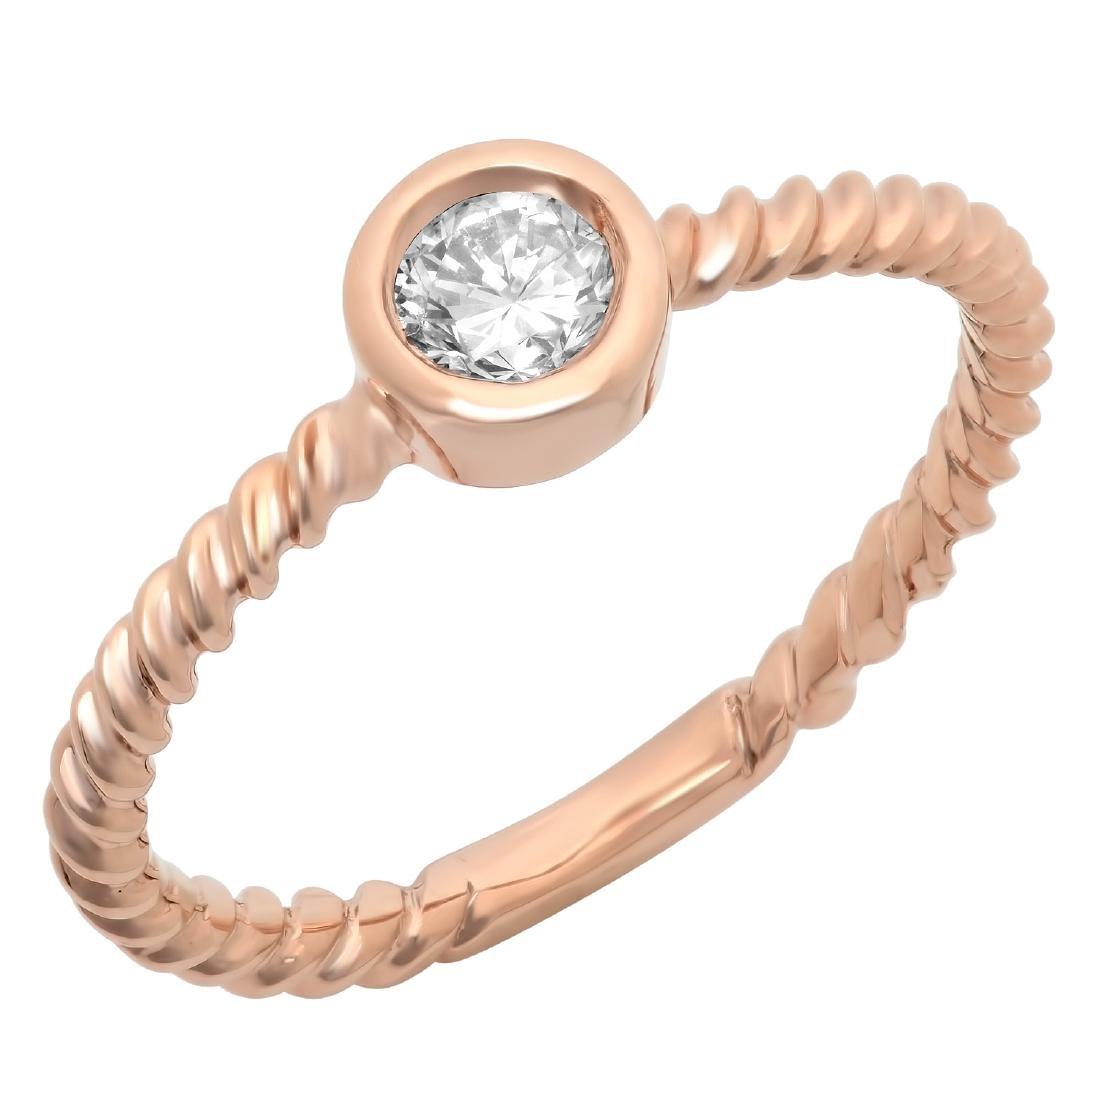 0.30 Carat Natural Diamond 18K Solid Rose Gold Ring